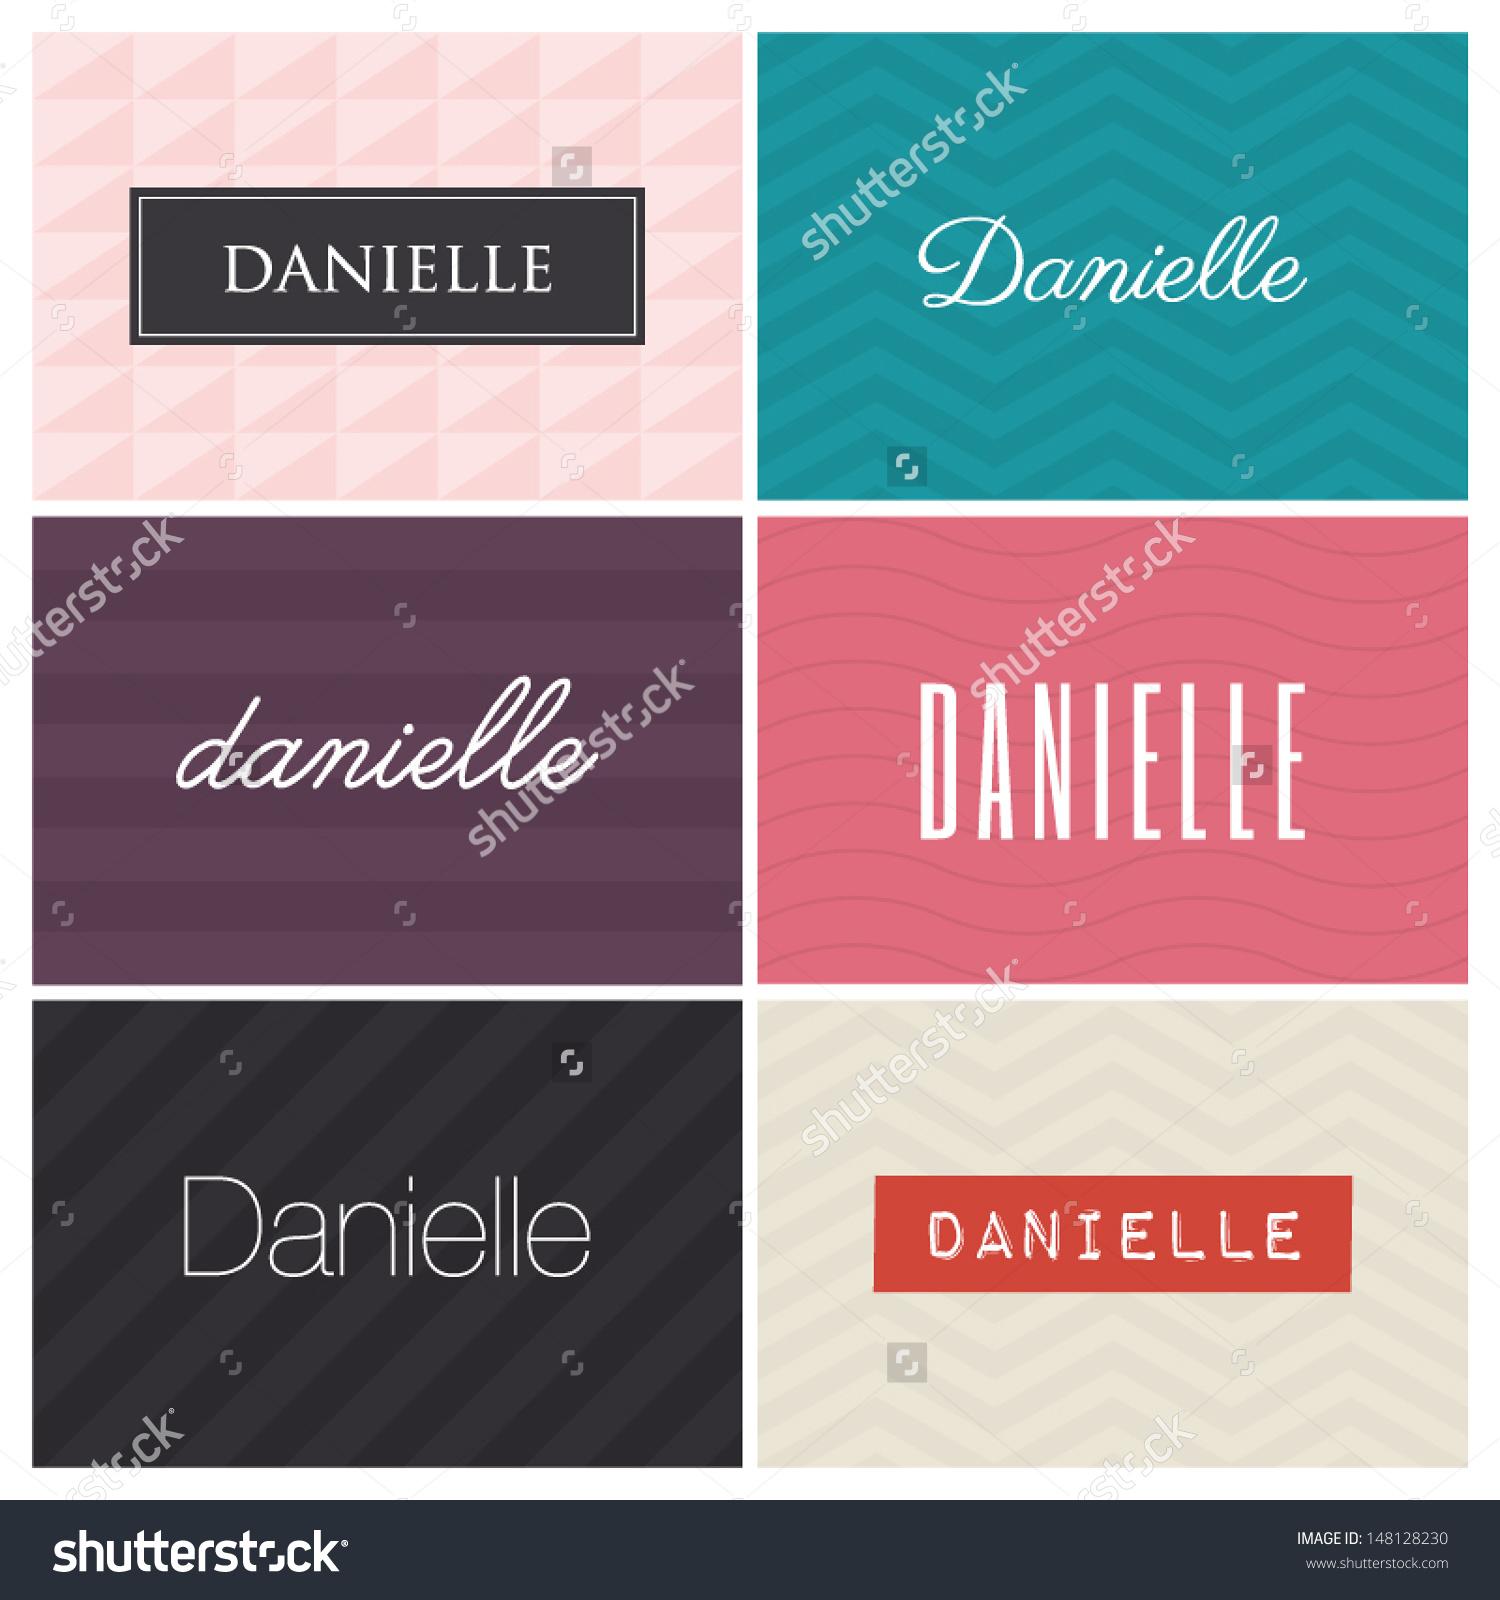 Name Danielle Graphic Design Elements Stock Vector 148128230.